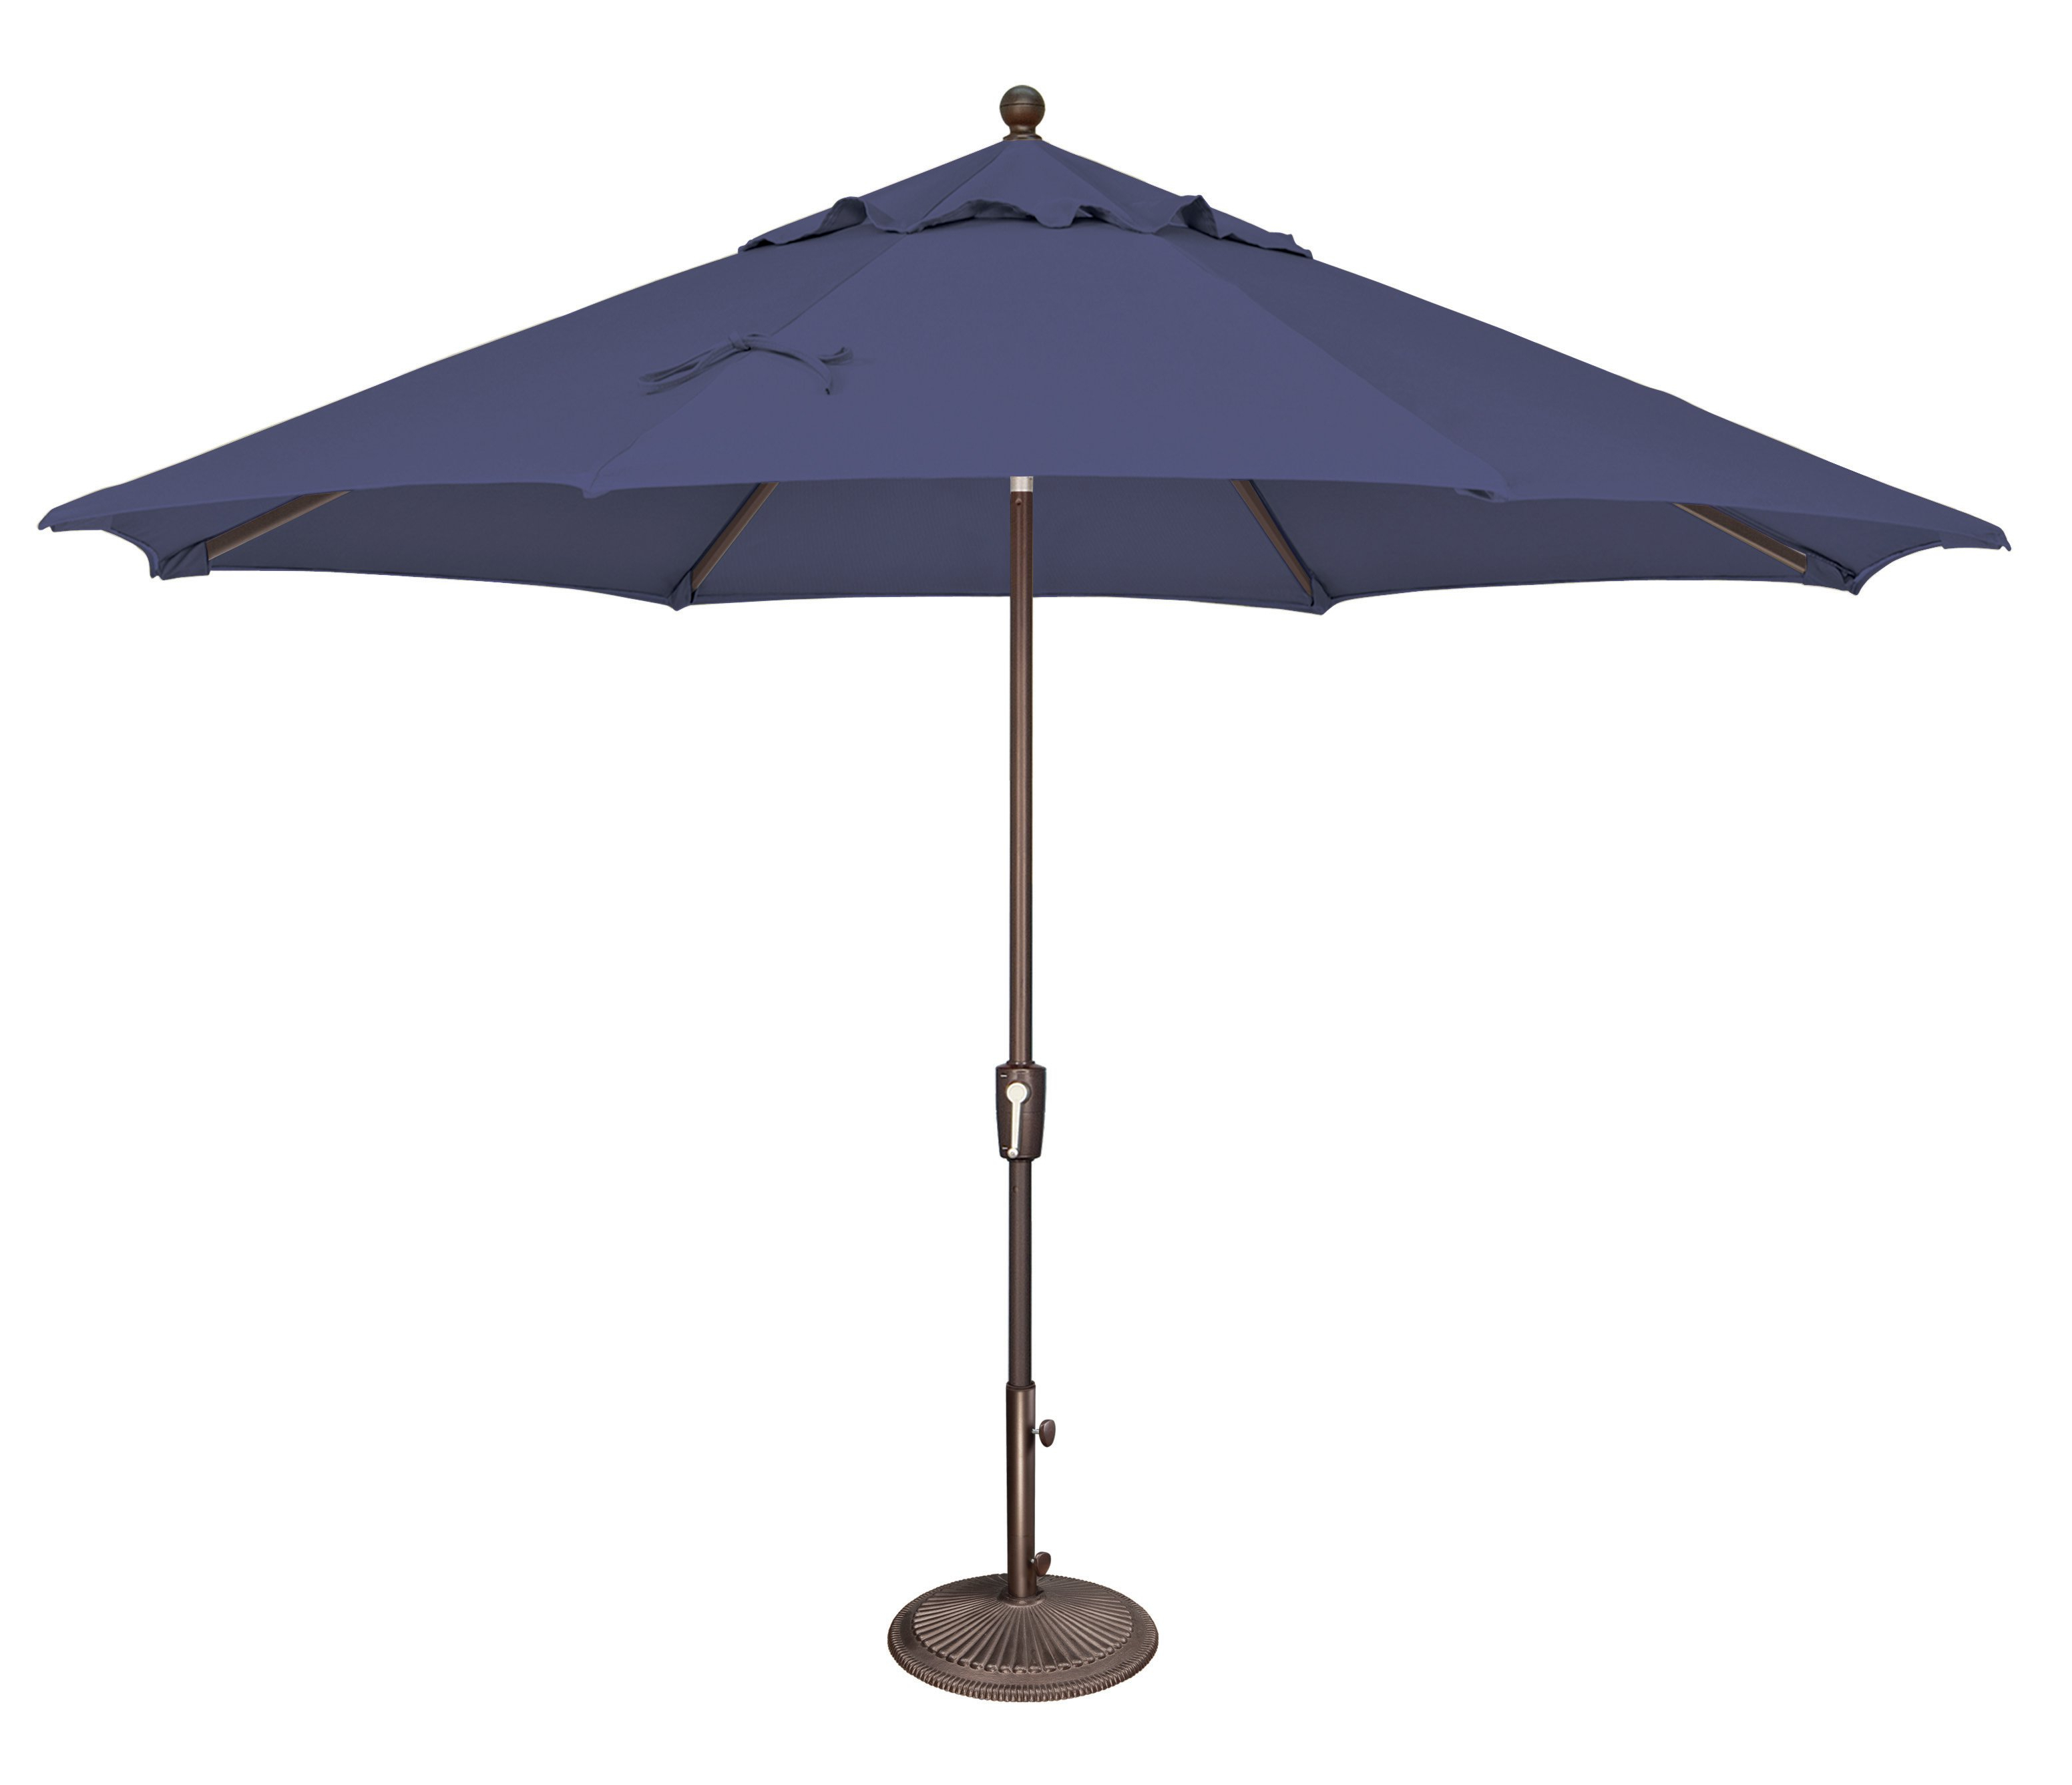 Launceston 11' Market Umbrella With Well Known Wallach Market Sunbrella Umbrellas (Gallery 16 of 20)